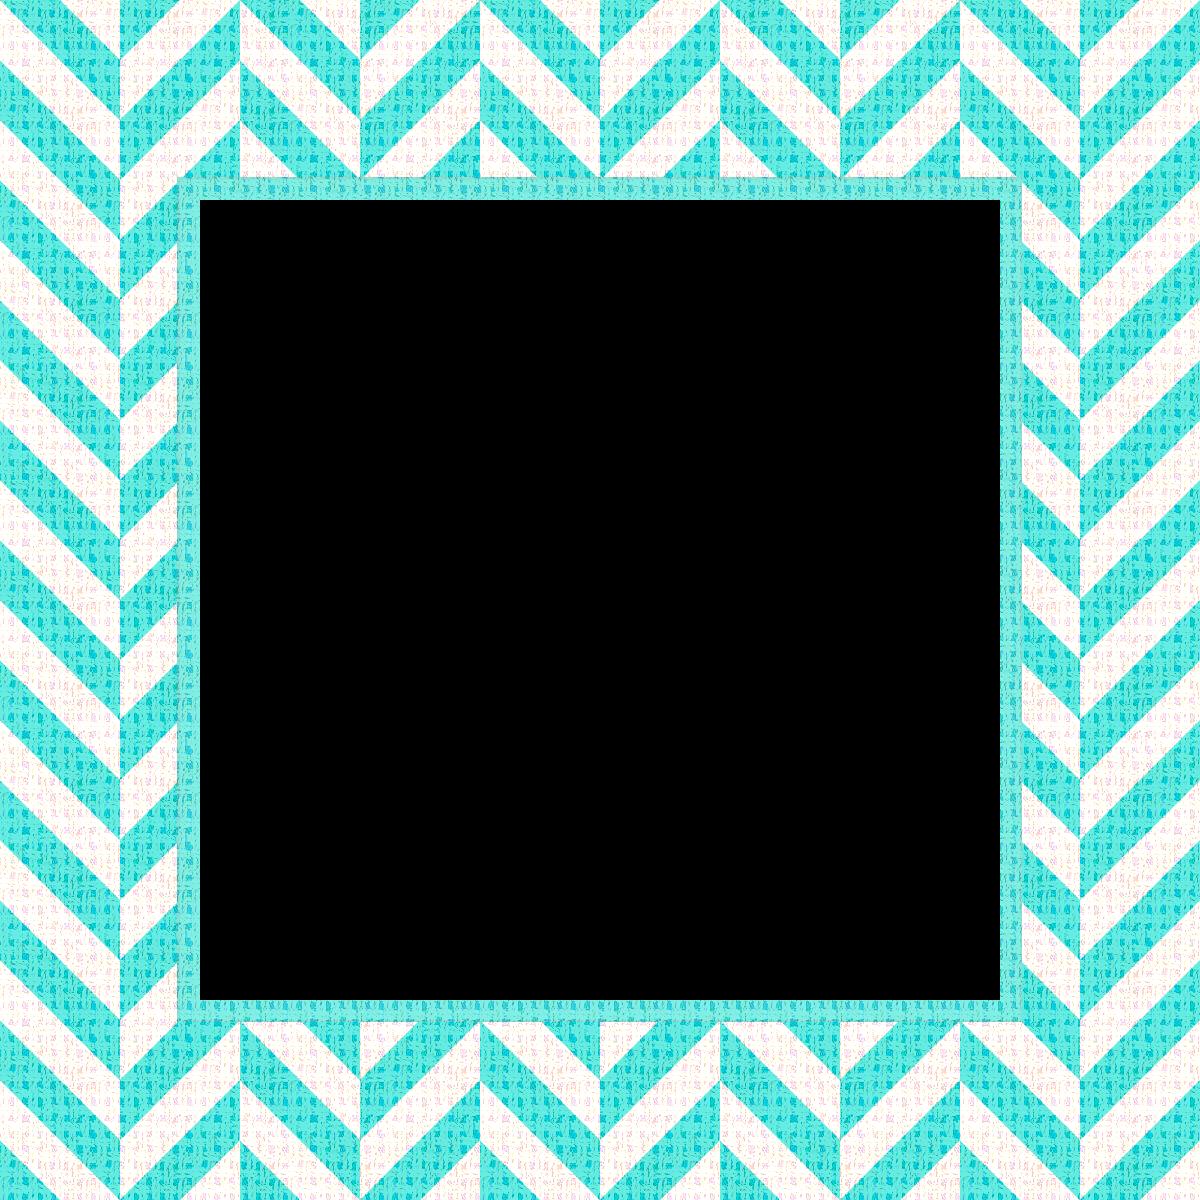 Free Chevron Frame Cliparts, Download Free Clip Art, Free.